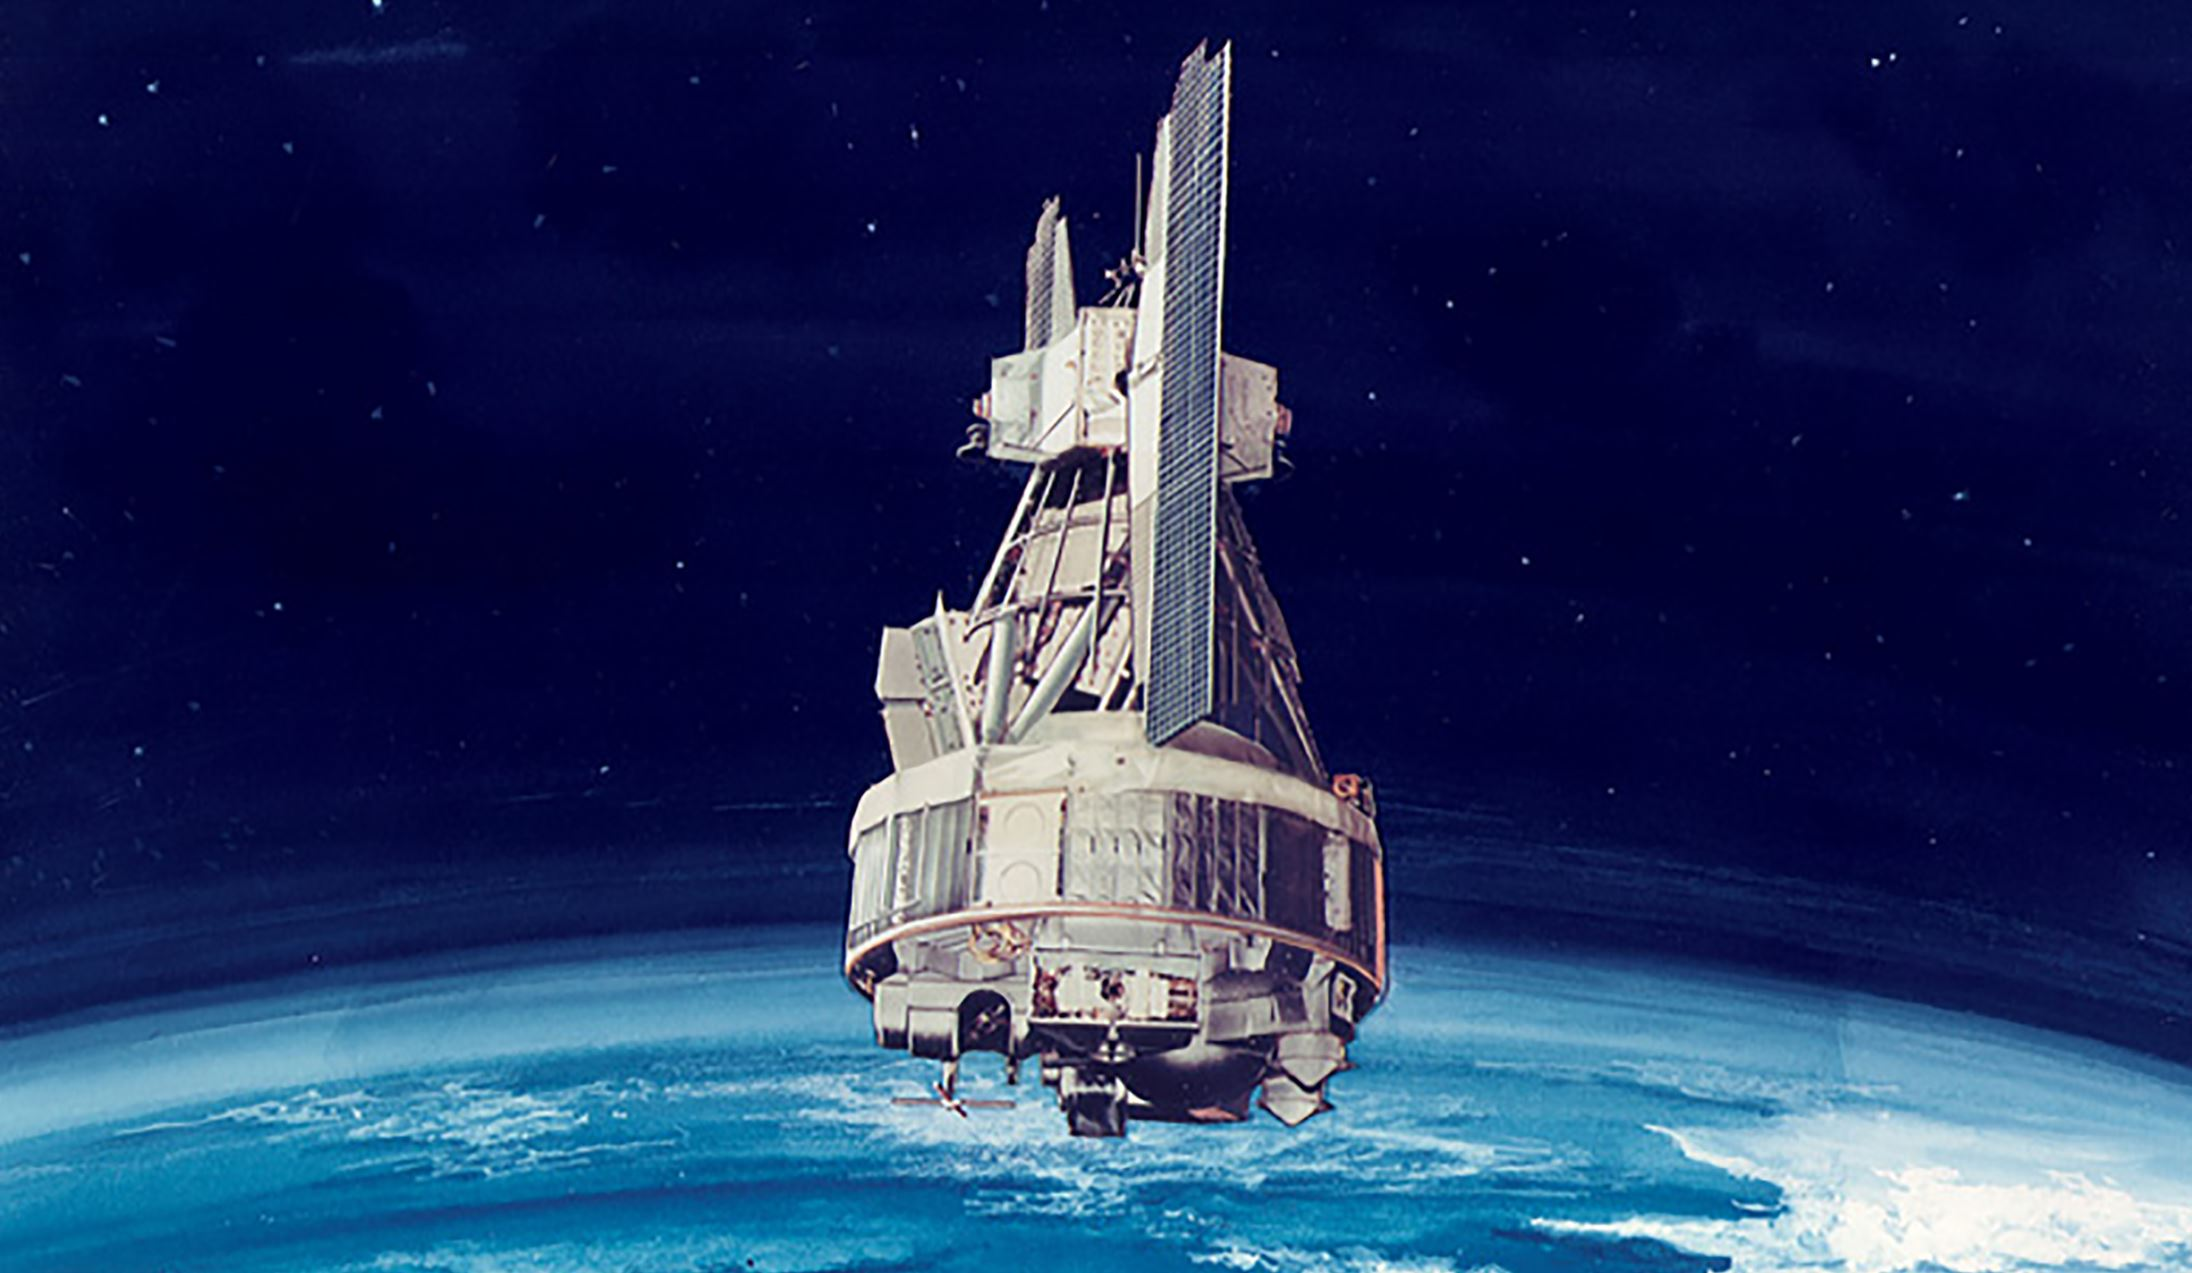 Artist's rendering of the Nimbus-3 spacecraft. - Image Credit: Credits: NASA